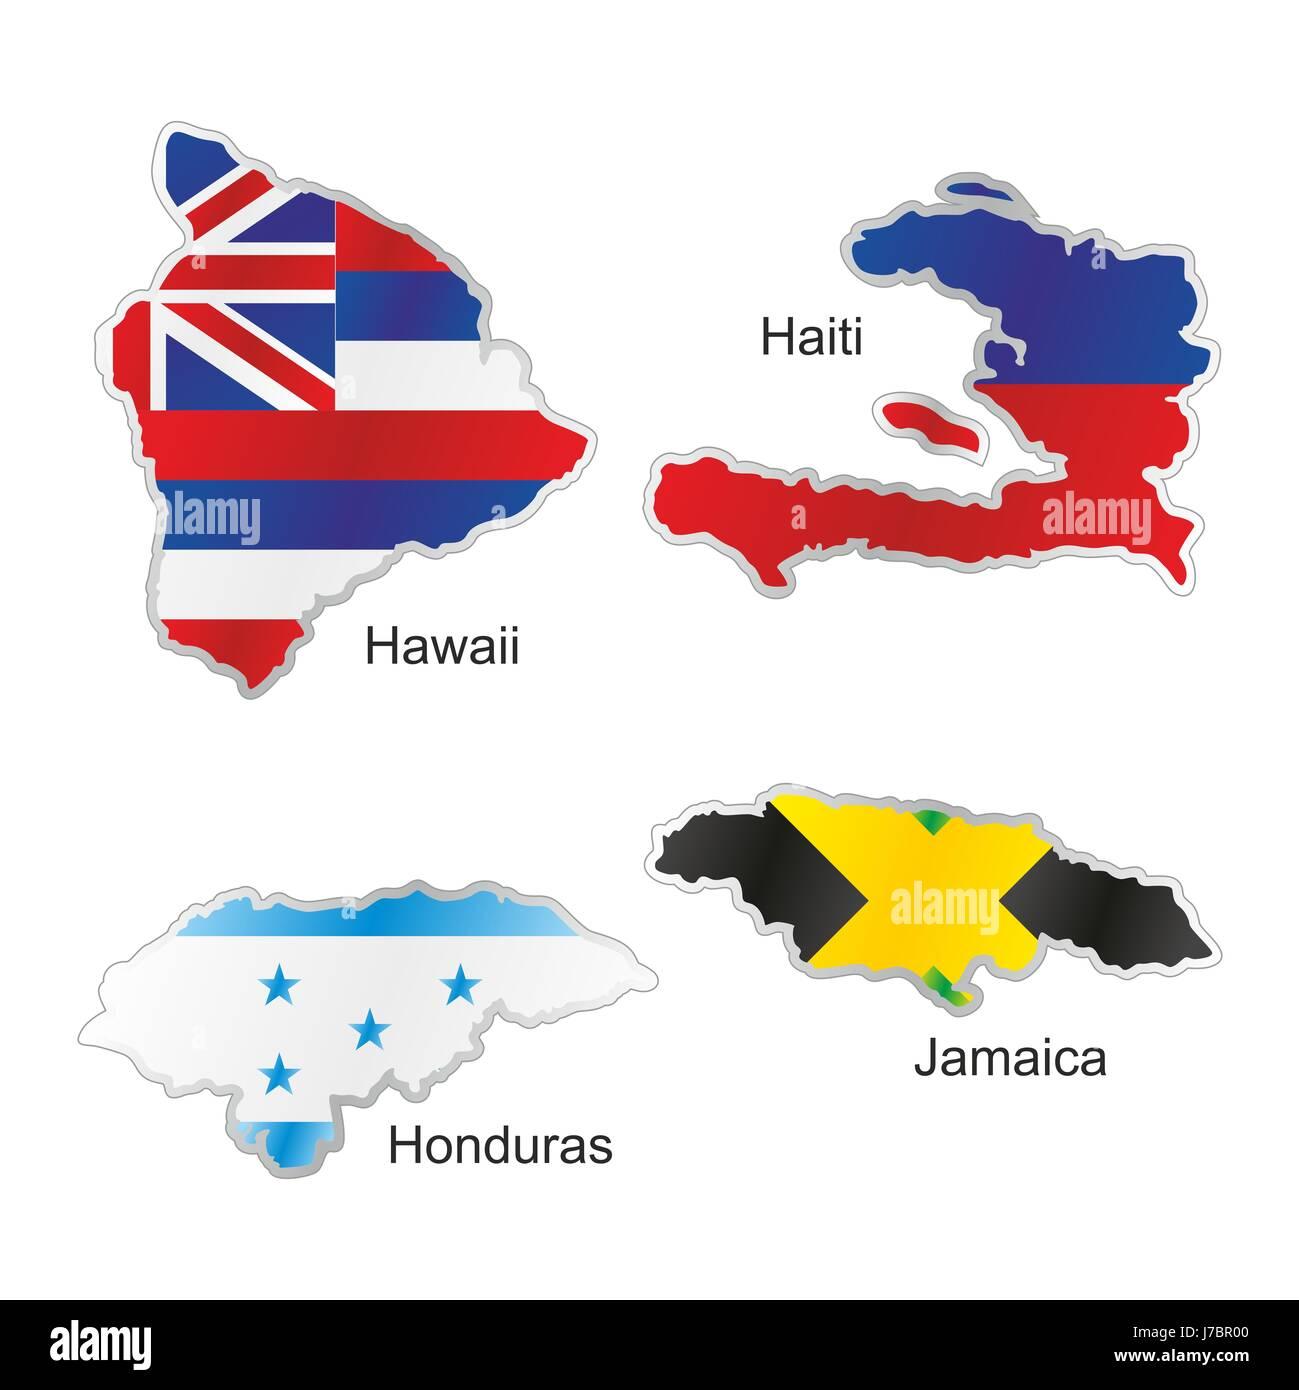 America flag honduras icon jamaica haiti map atlas map of the world america flag honduras icon jamaica haiti map atlas map of the world hawaii gumiabroncs Choice Image